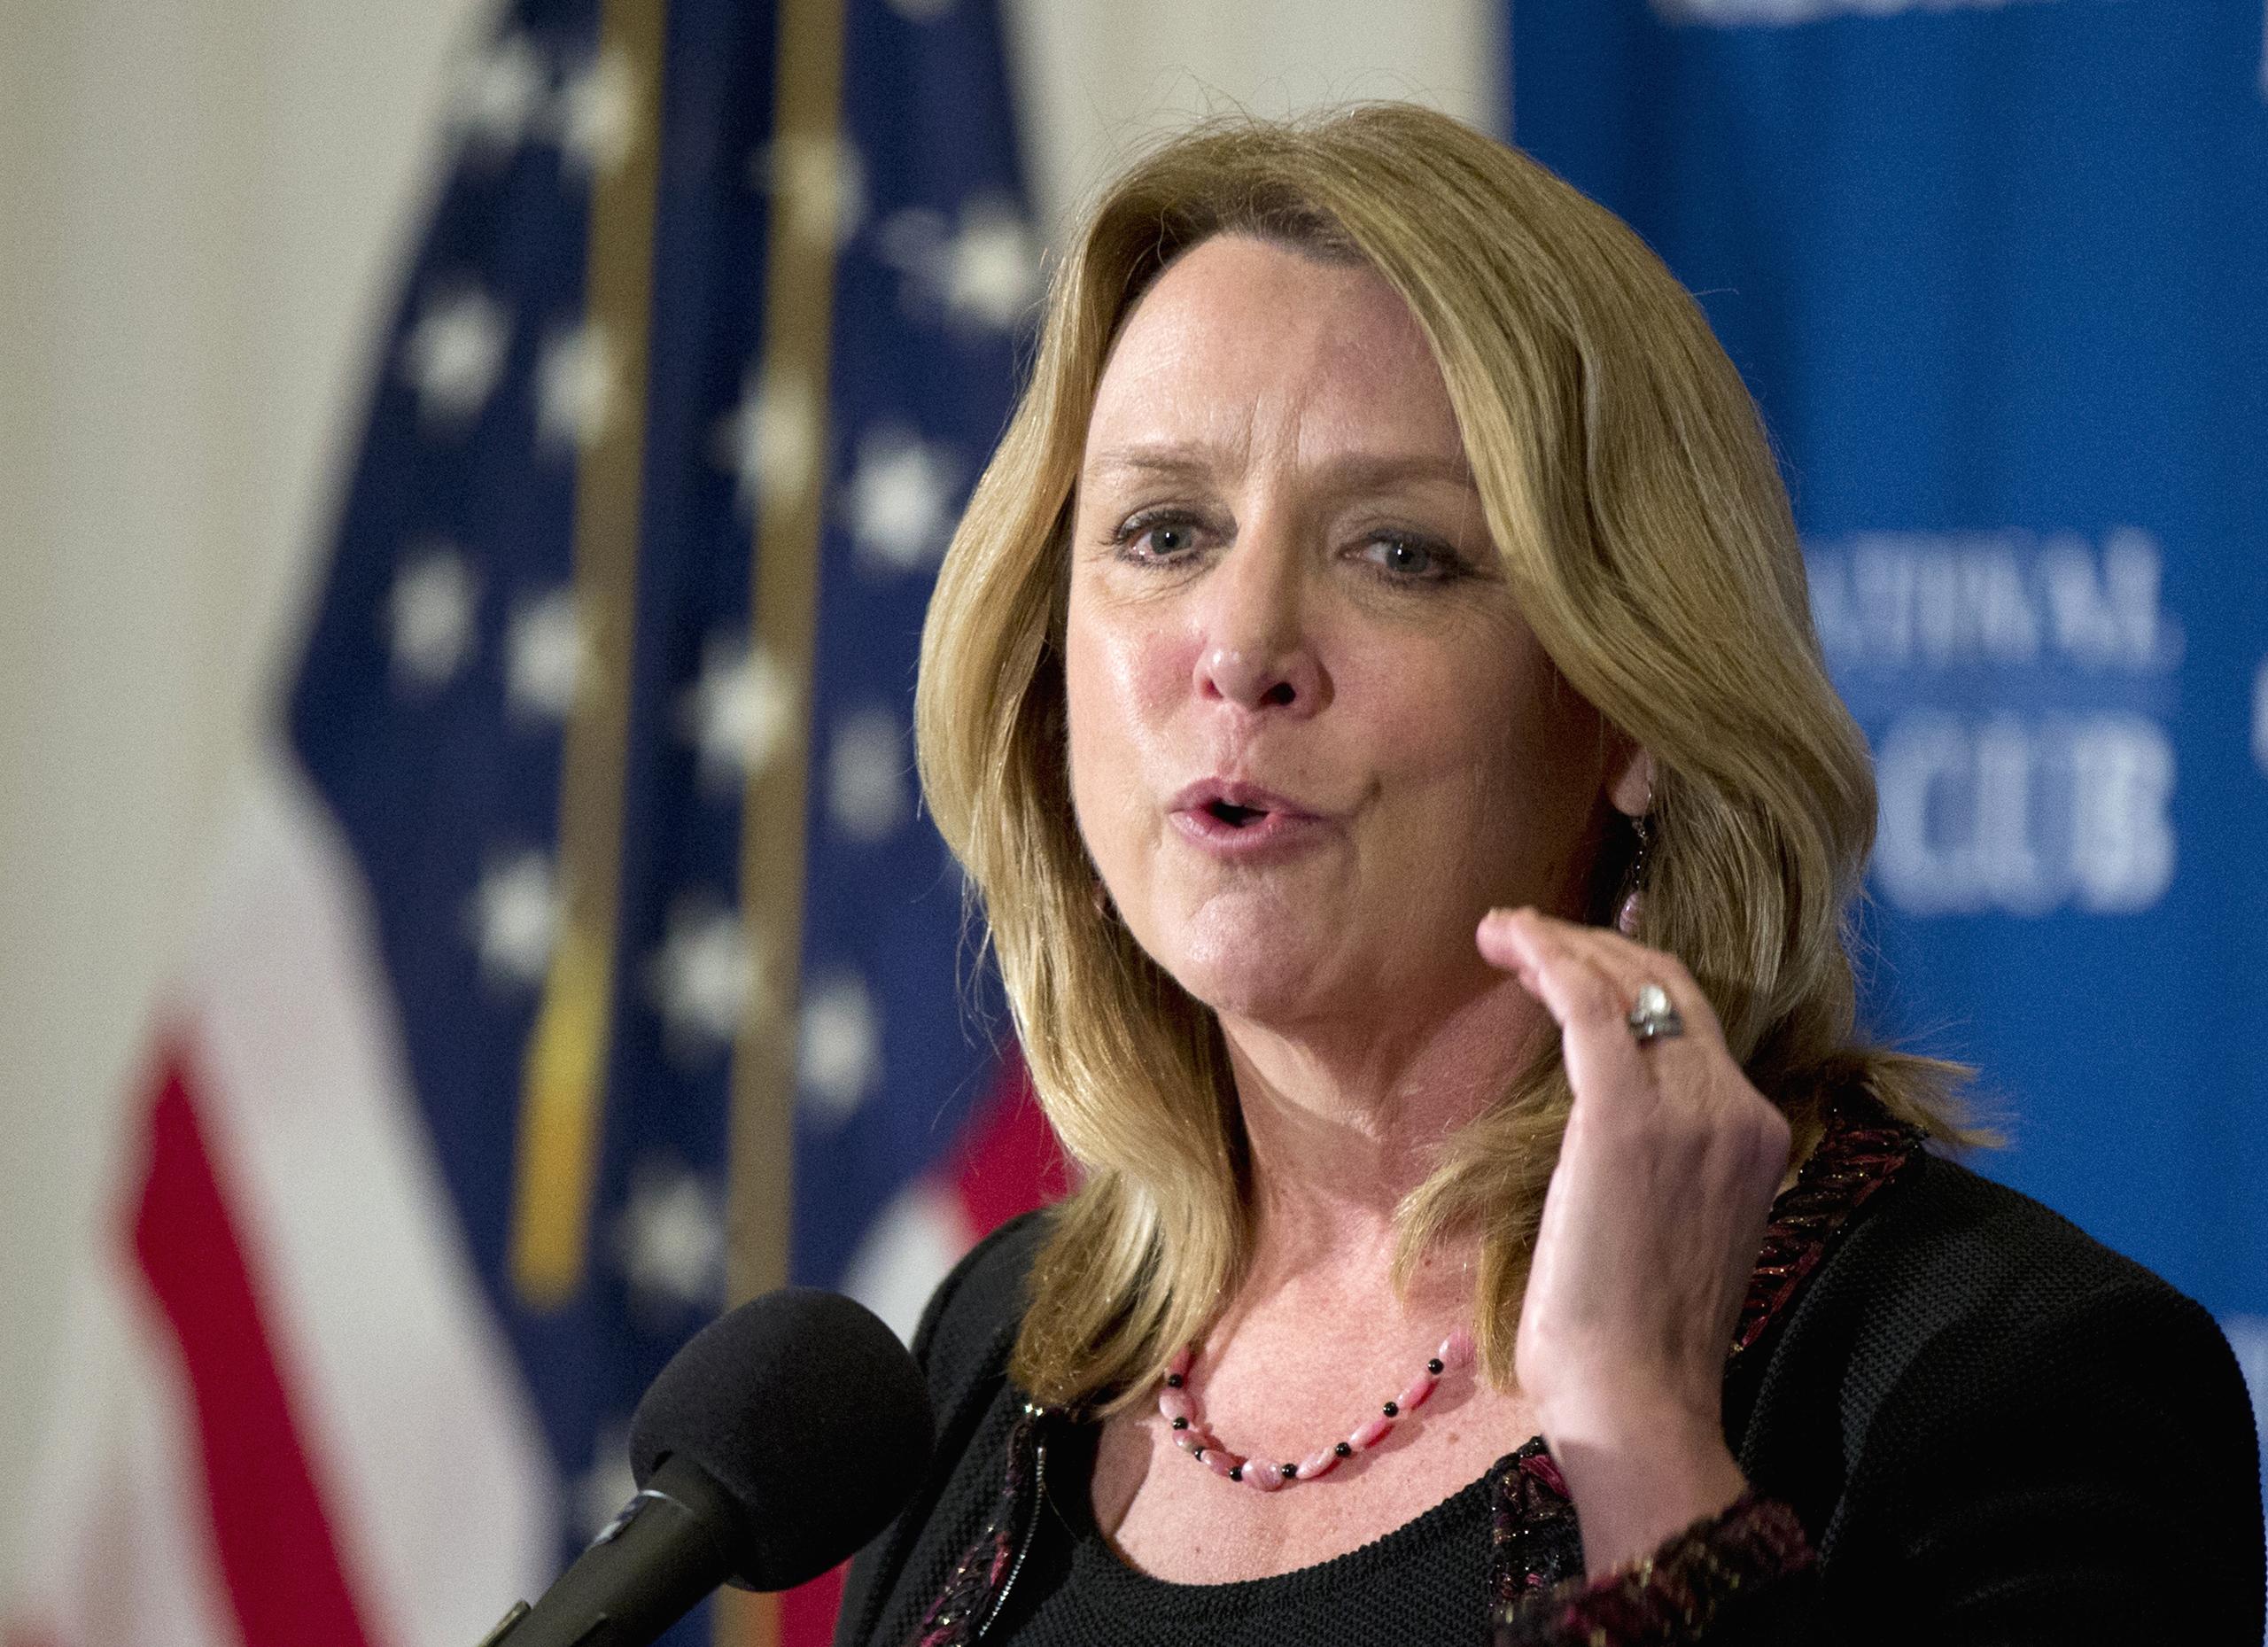 Air Force Secretary Deborah Lee James speaks at the National Press Club in Washington on Dec. 2, 2015.